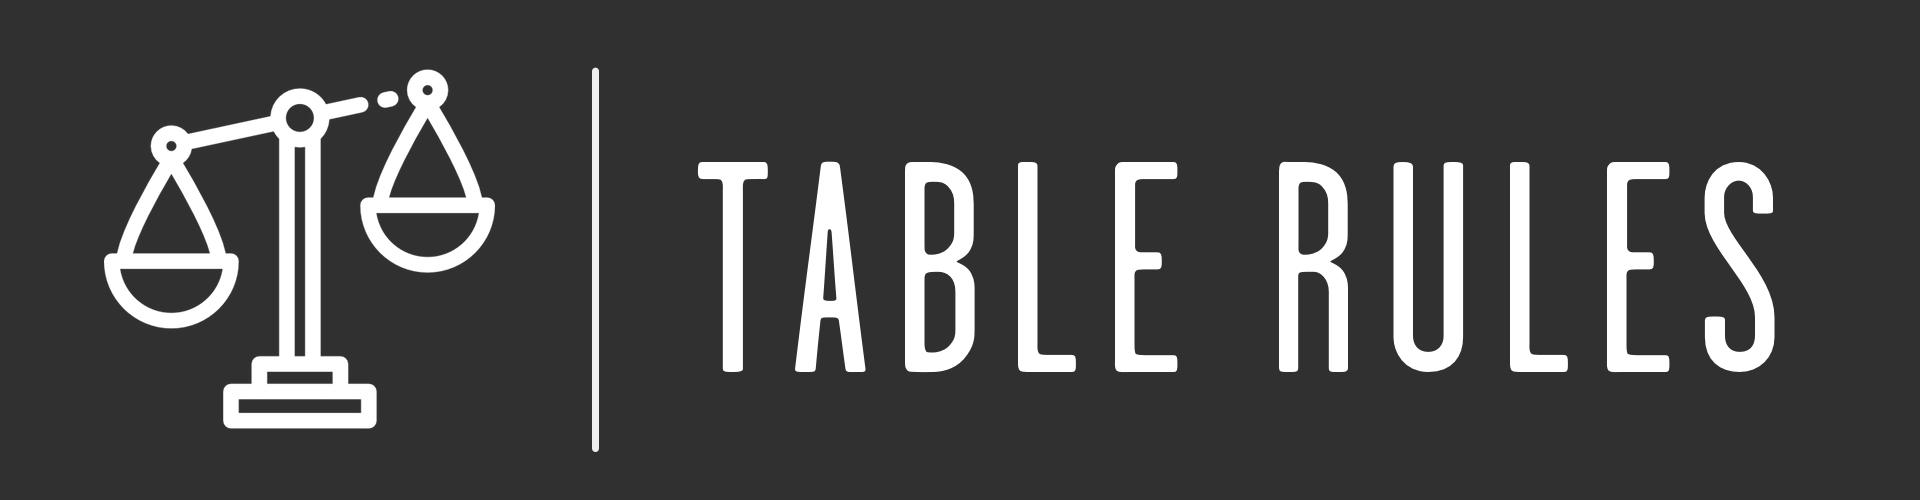 header - table rules.jpg